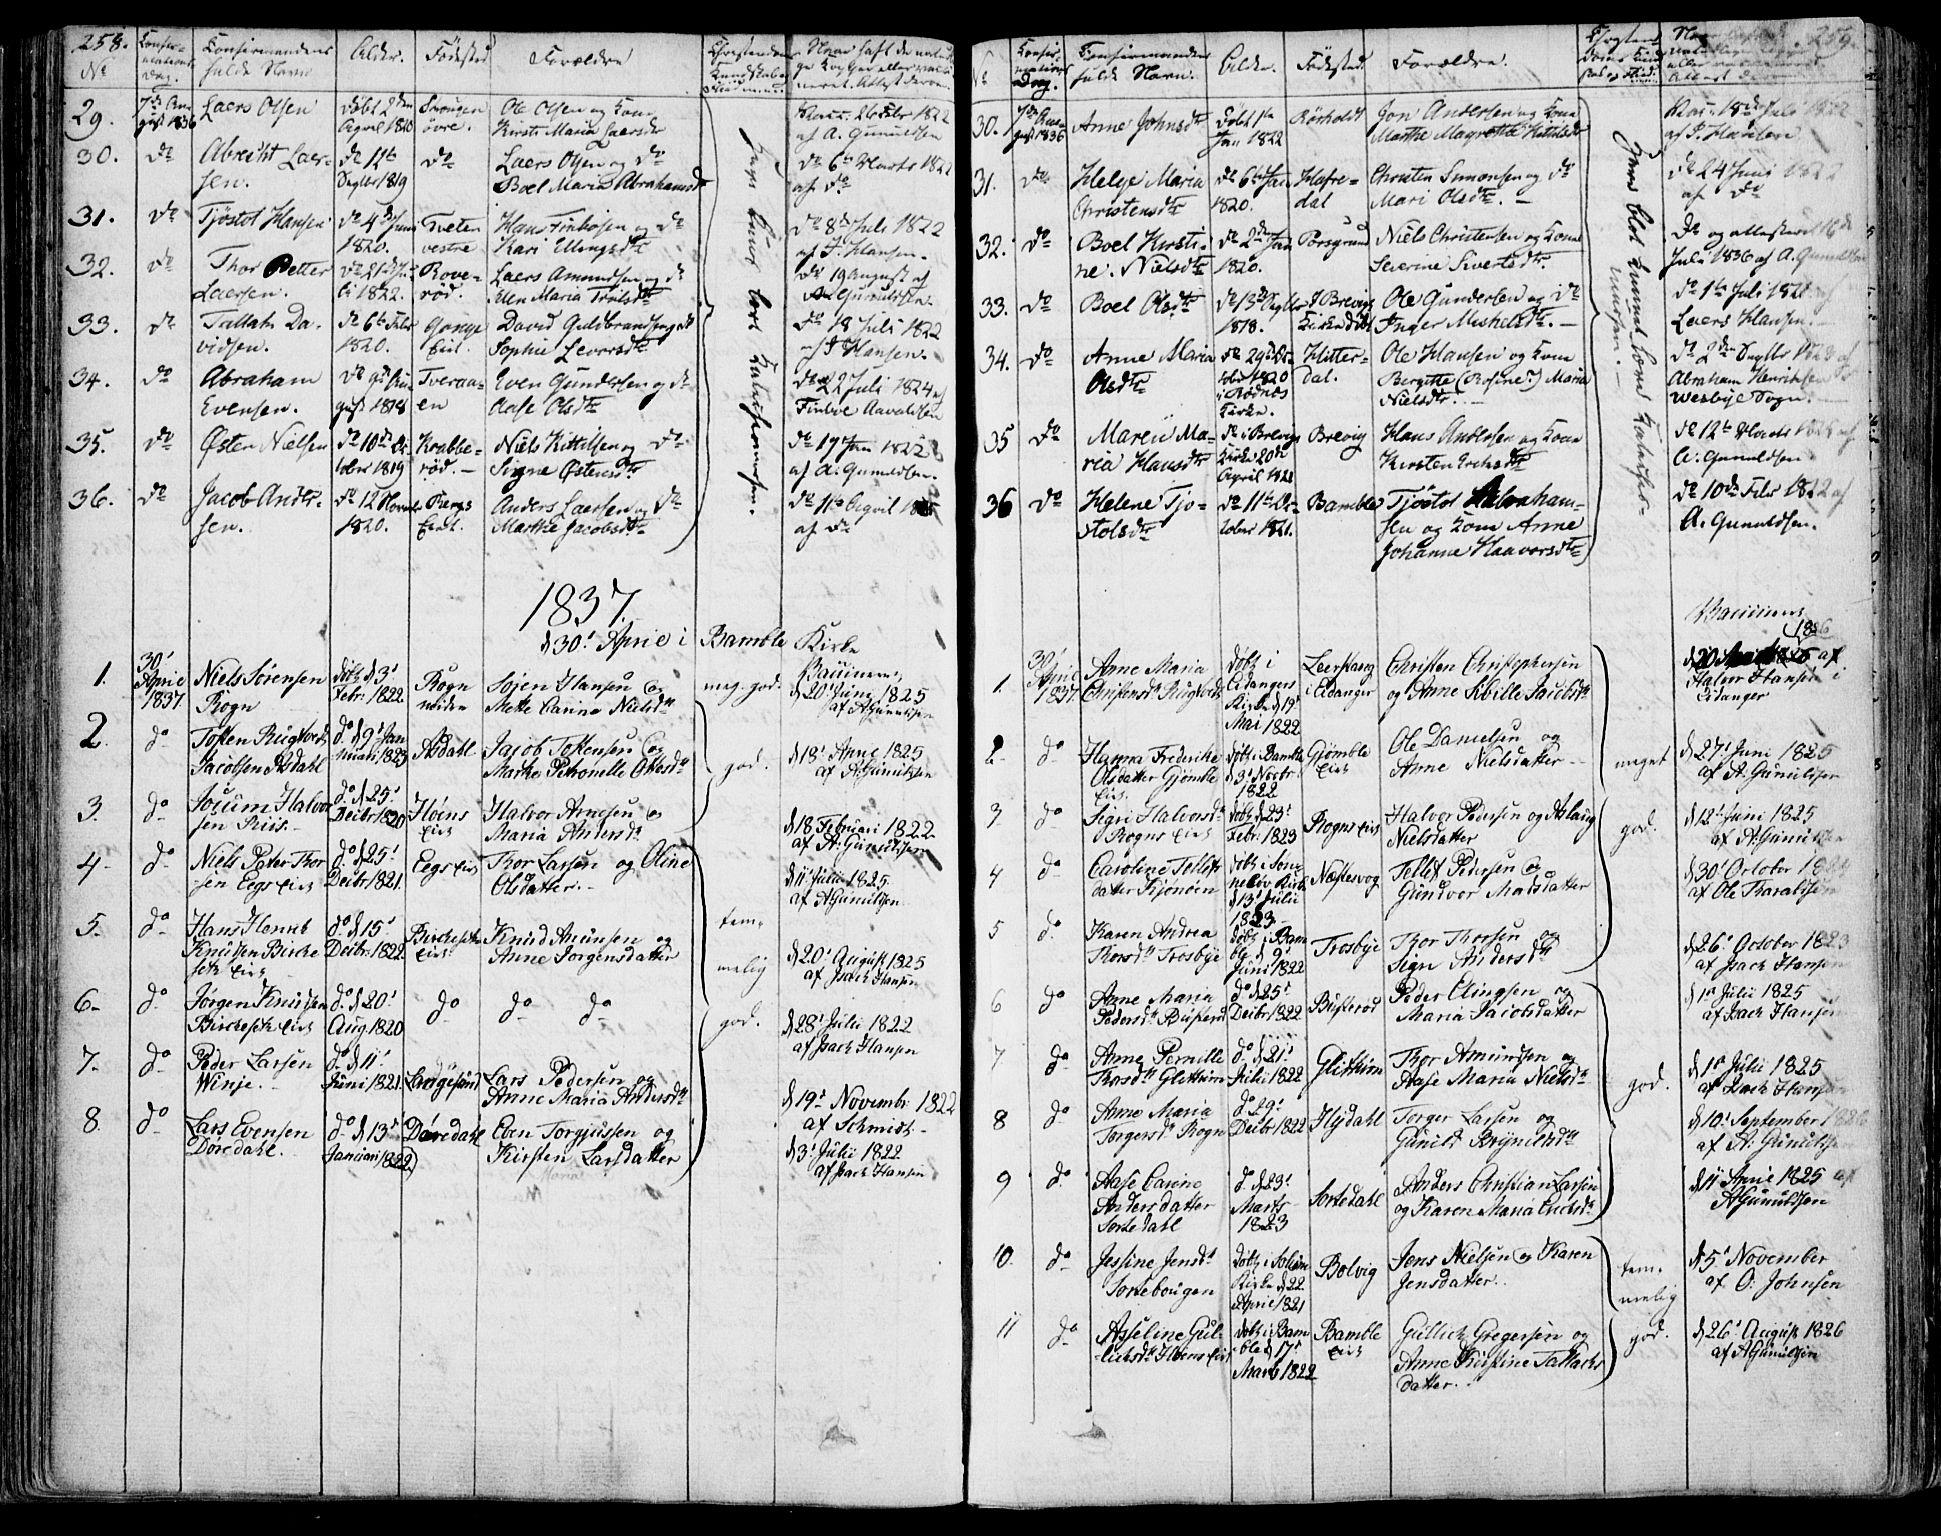 SAKO, Bamble kirkebøker, F/Fa/L0004: Ministerialbok nr. I 4, 1834-1853, s. 258-259